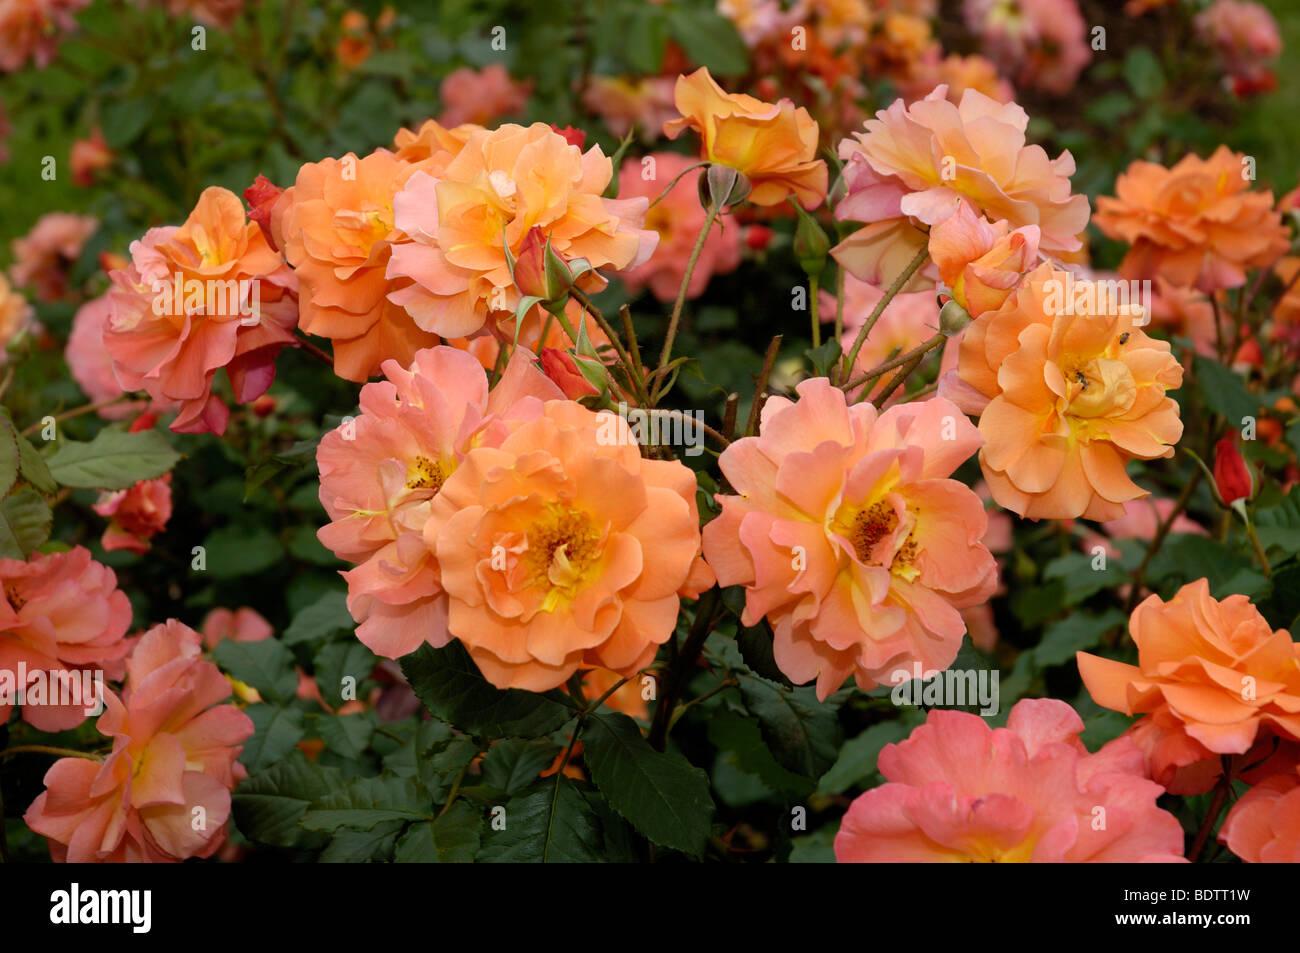 Rosa ad arbusto, WesterlandRosa spec., Strauchrose Westerland Immagini Stock